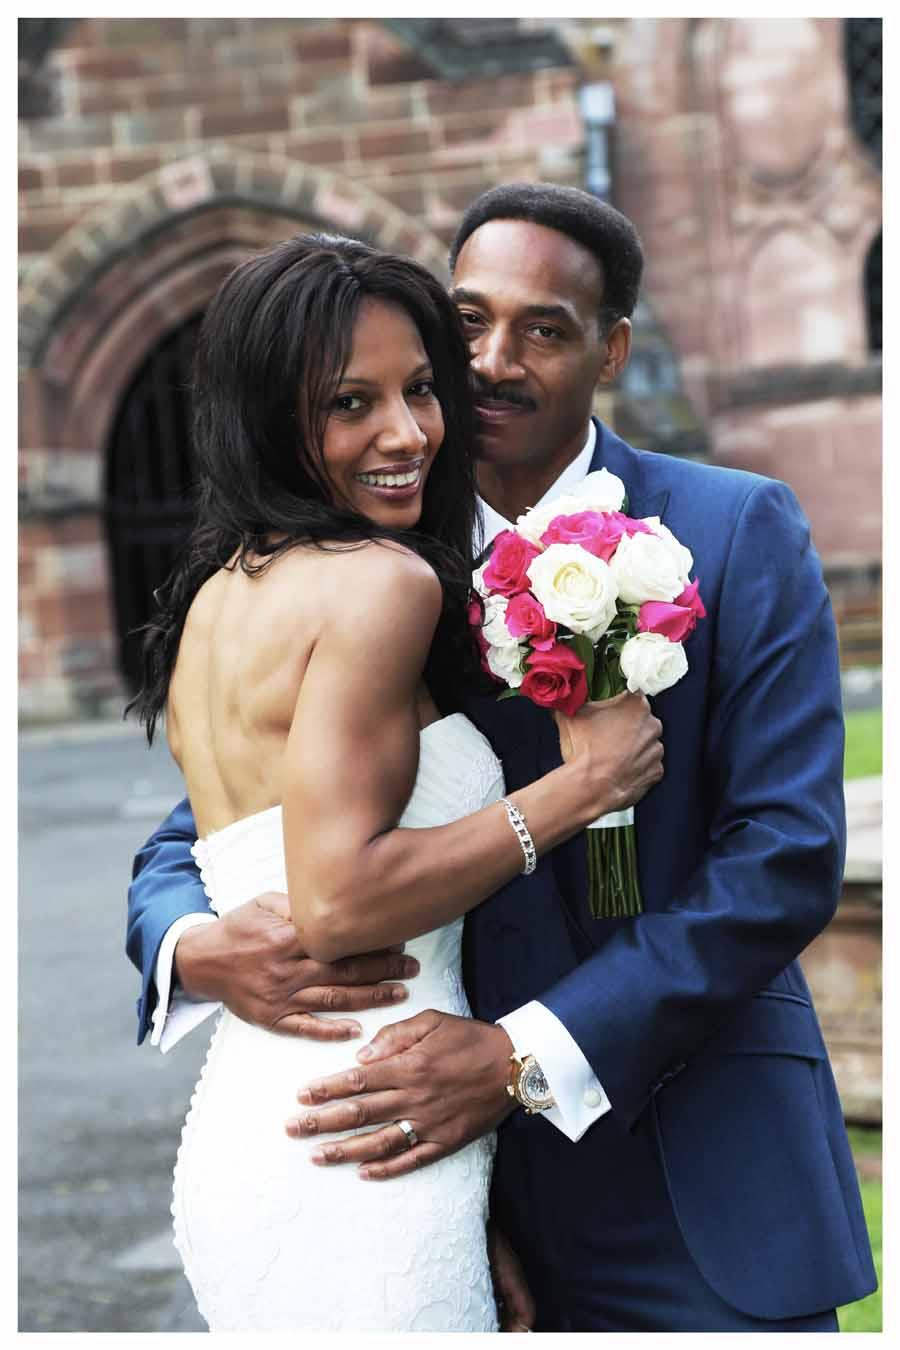 BRIDE & GROOM Photos by  Simeon Thaw copyright 2014 (35).jpg